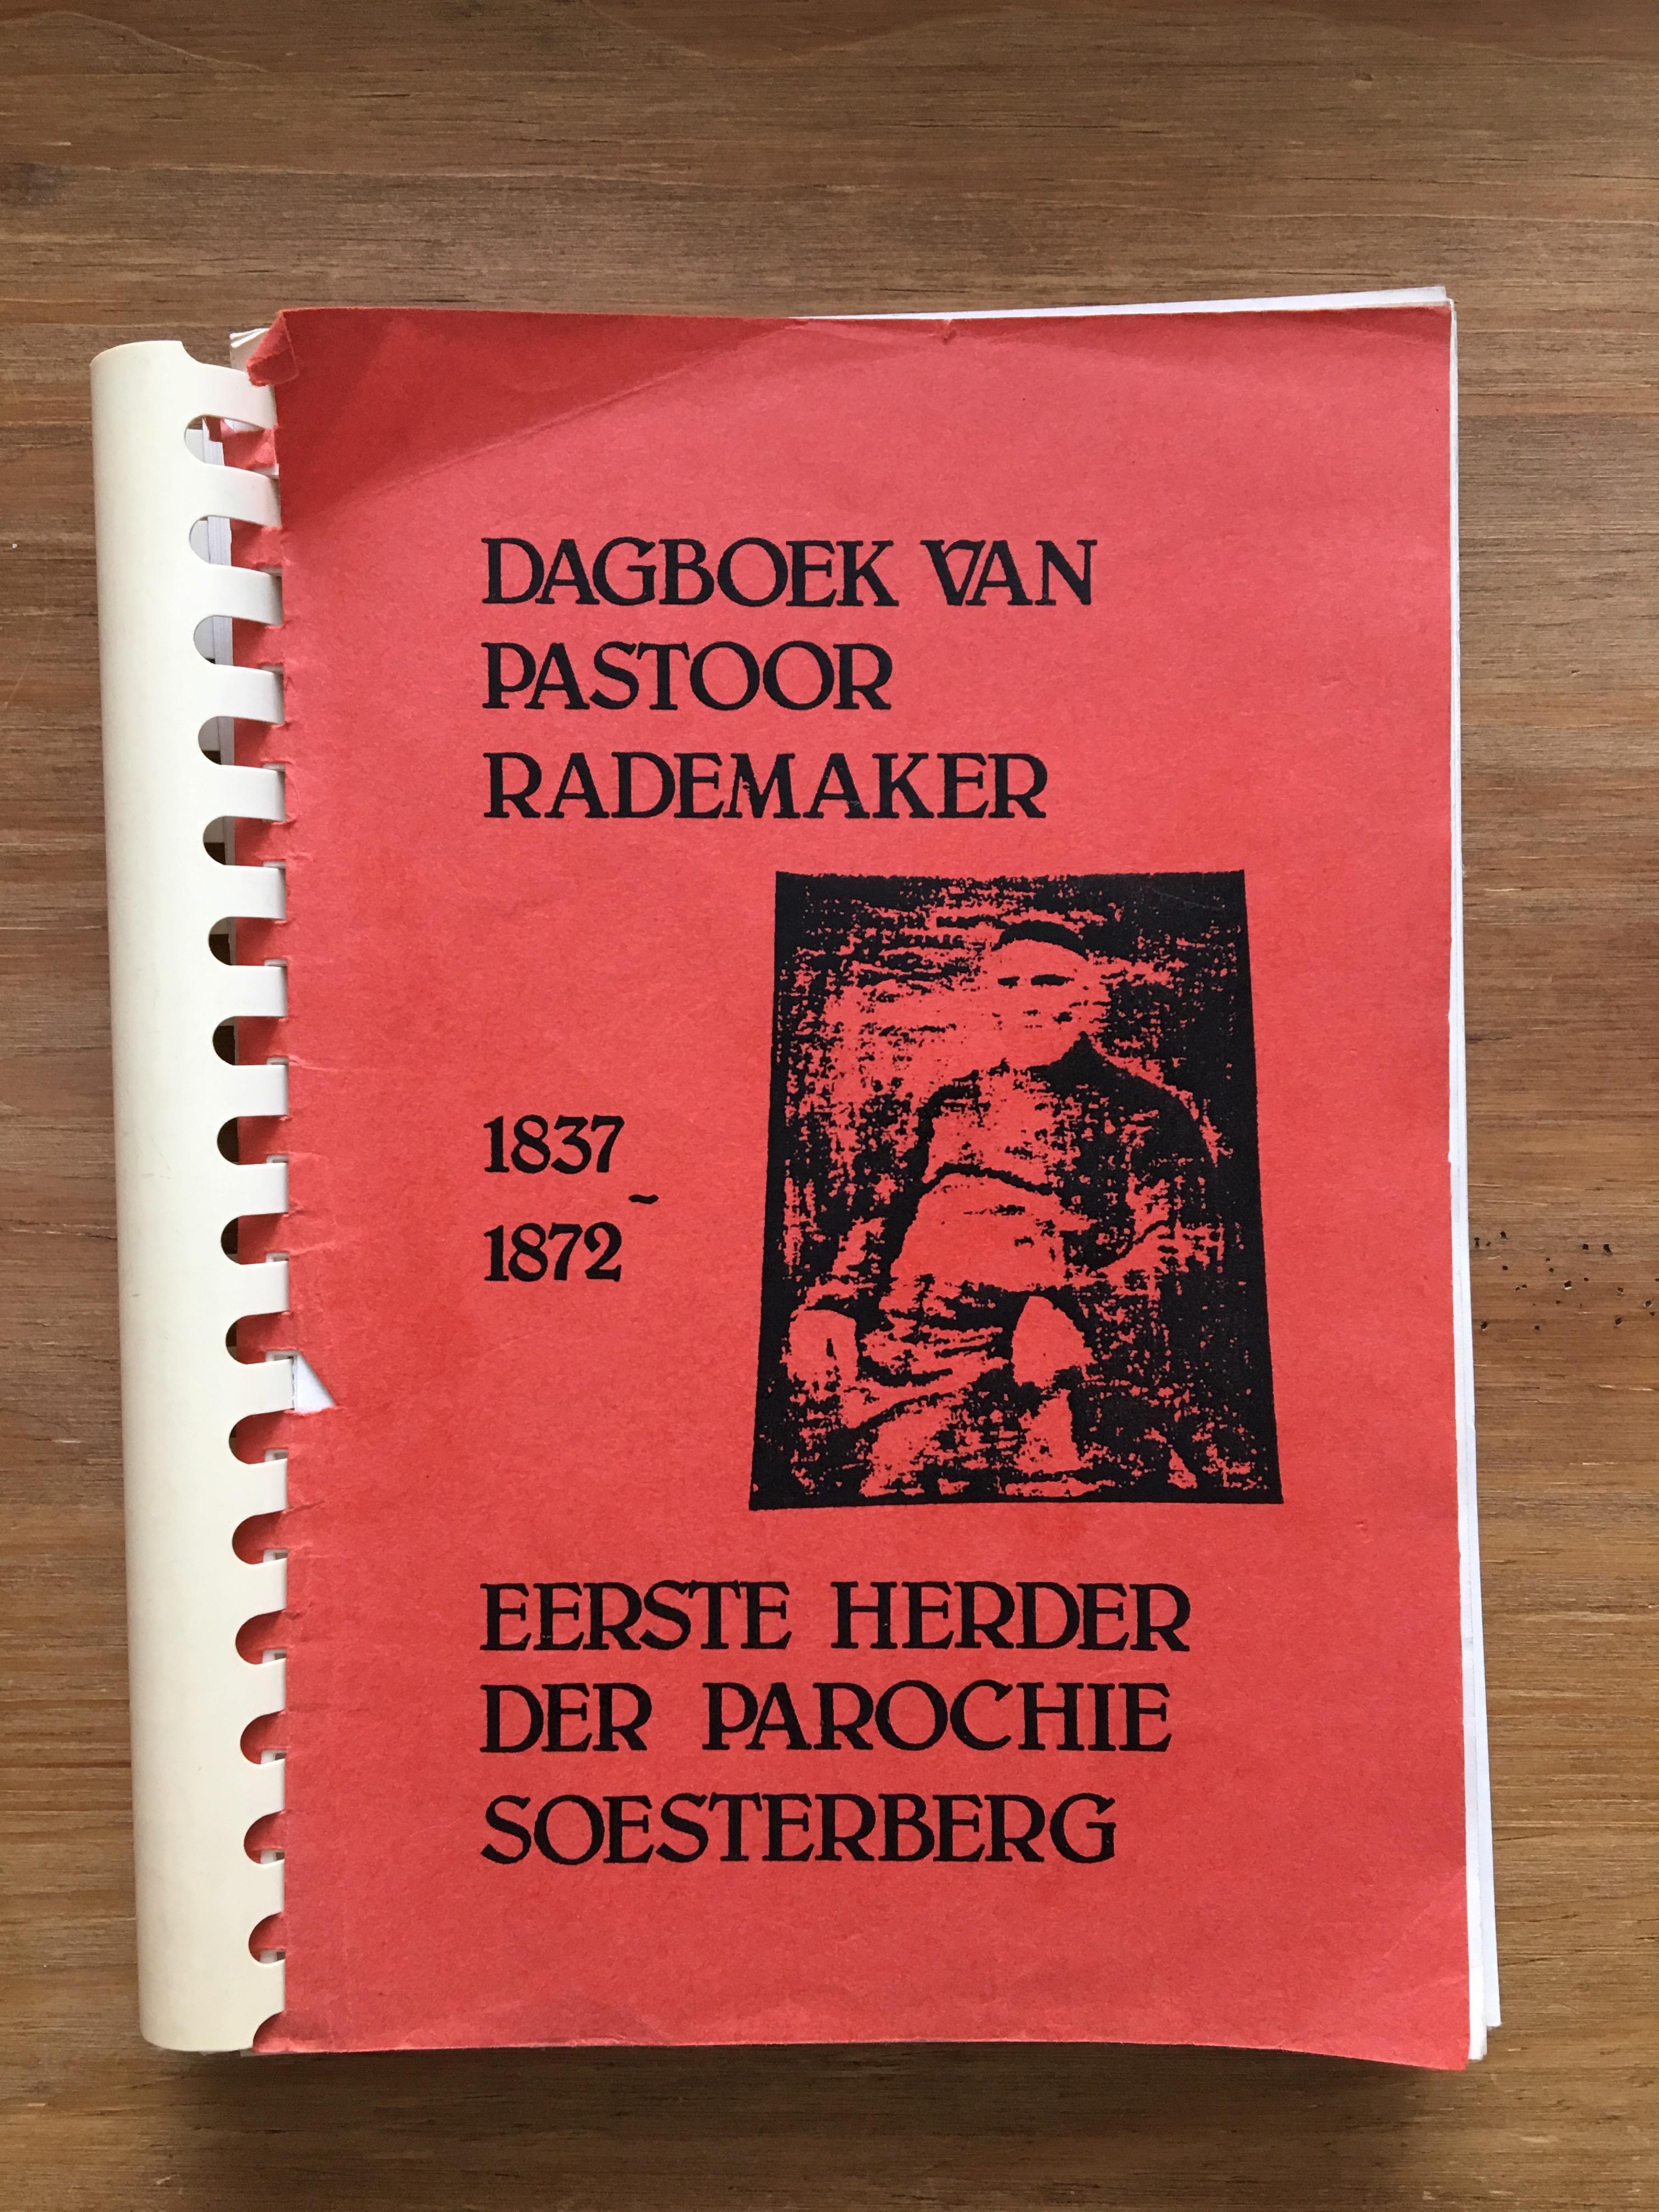 Ludovicus Rademaker pastoor soesterberg